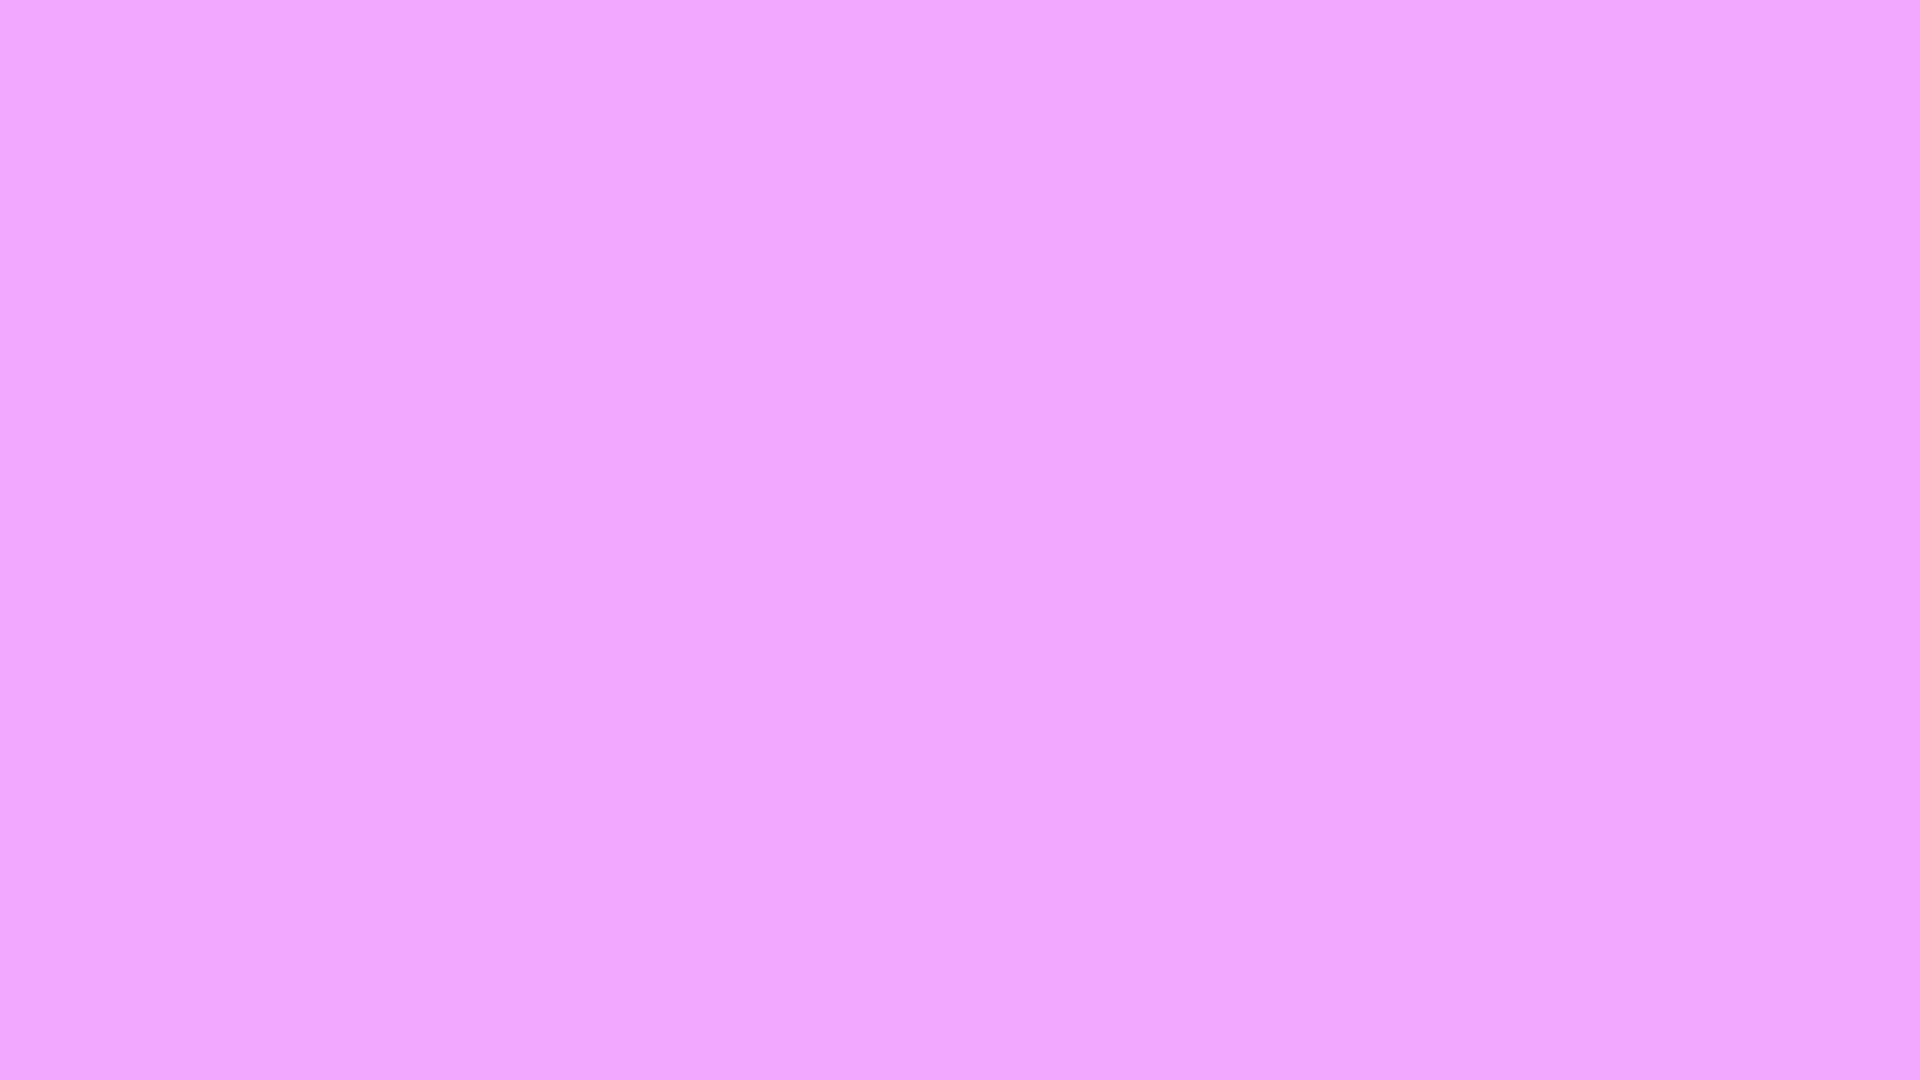 Free download 1920x1080 Rich Brilliant Lavender Solid ...